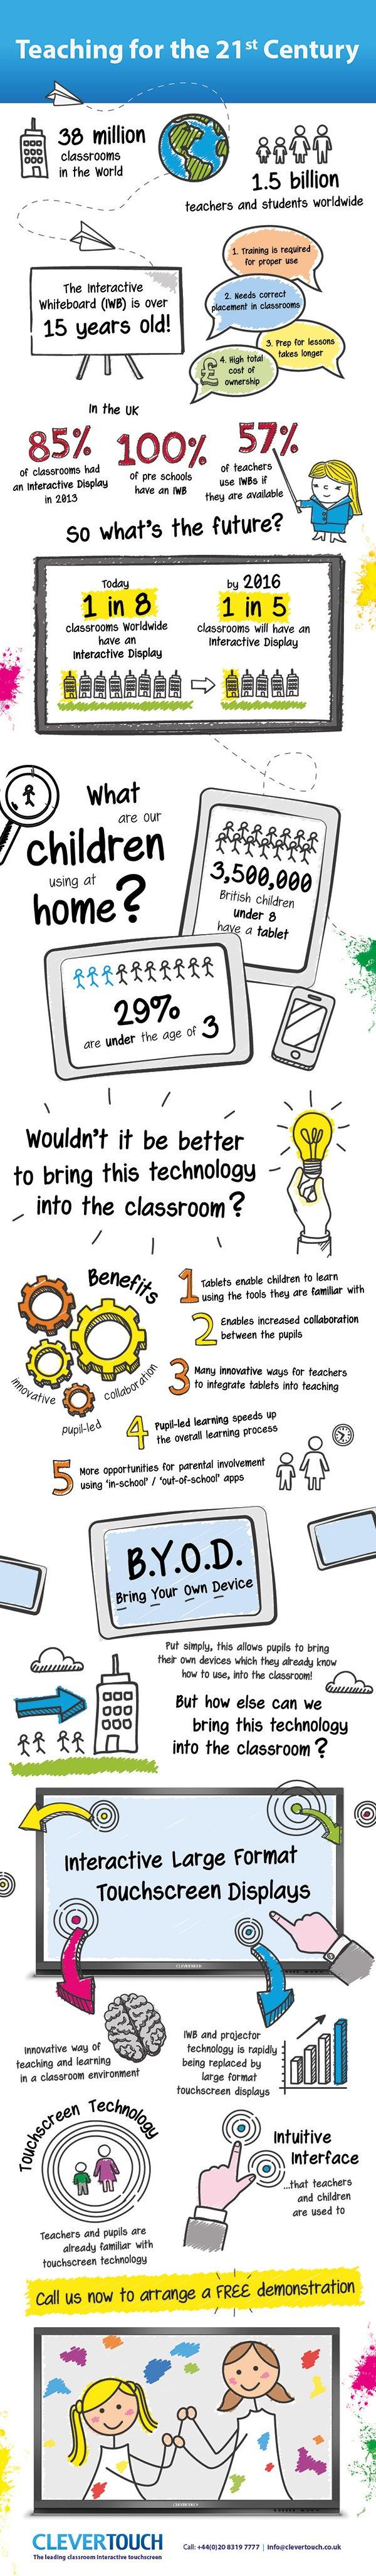 21st Century Teaching Infographic